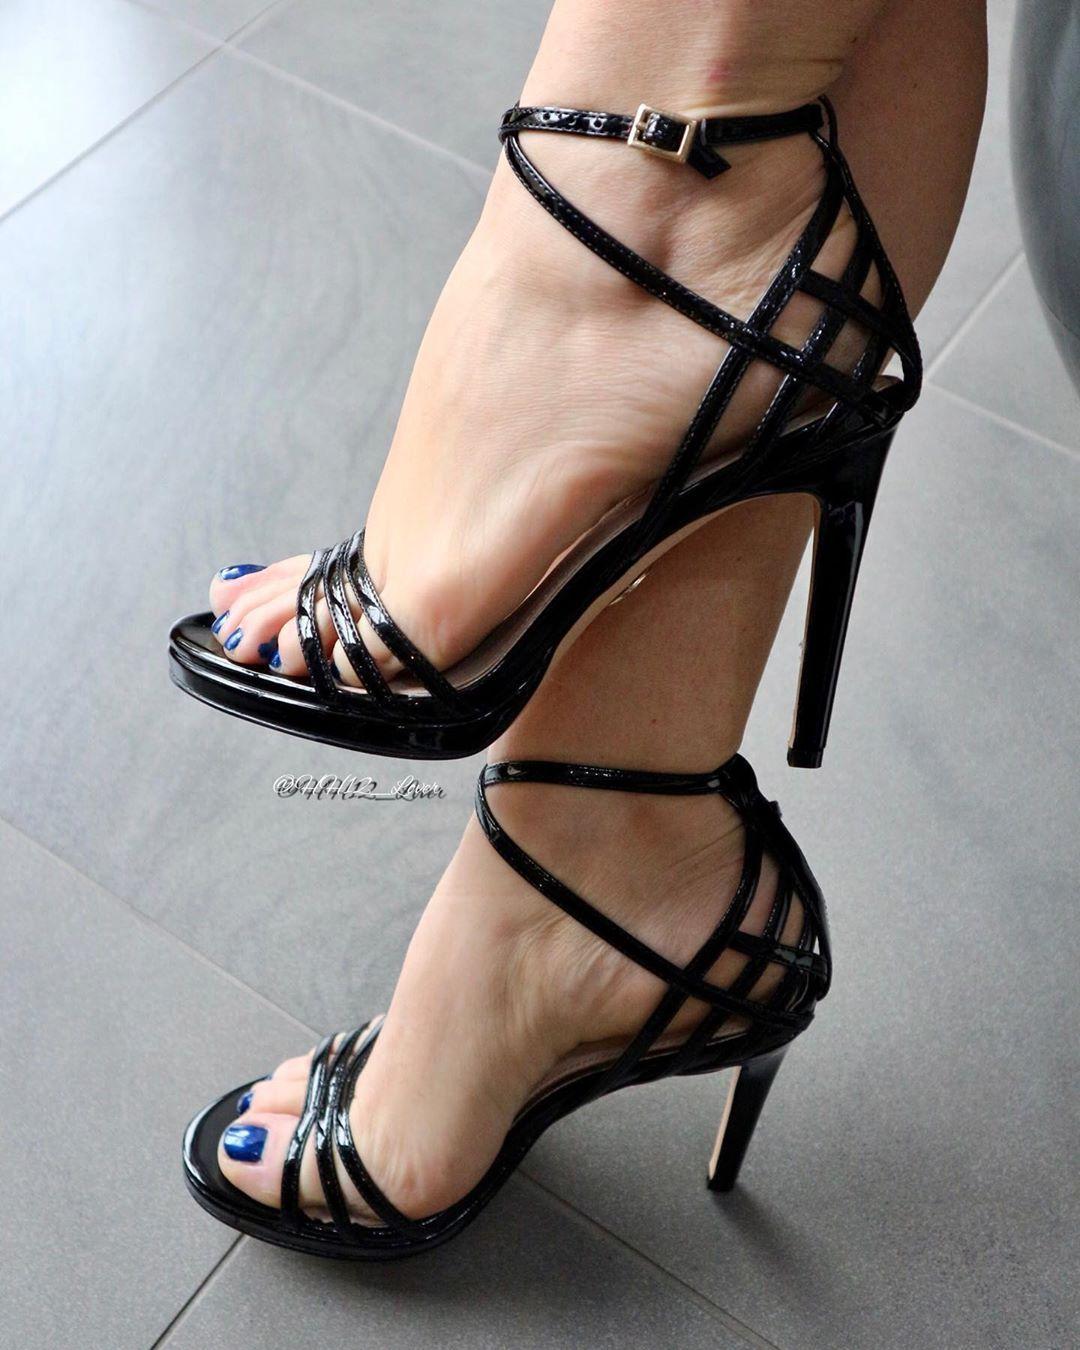 @buffaloshoes #sandals #heelsoftheday #heelsofinstagram  #hh12_lover #highheels ..., #blackheels #blacksandals #feetarch #feetlover #feetslave #feetstagram #heels #heelsfetish #heelsmodel #heelsofinstagram #heelsoftheday #hh12_lover #highheels #highheelshoes #highheelsmurah #instaheels #killerheels #lovelyheels #sandals #sexyheels #sexysandals #shoestyle